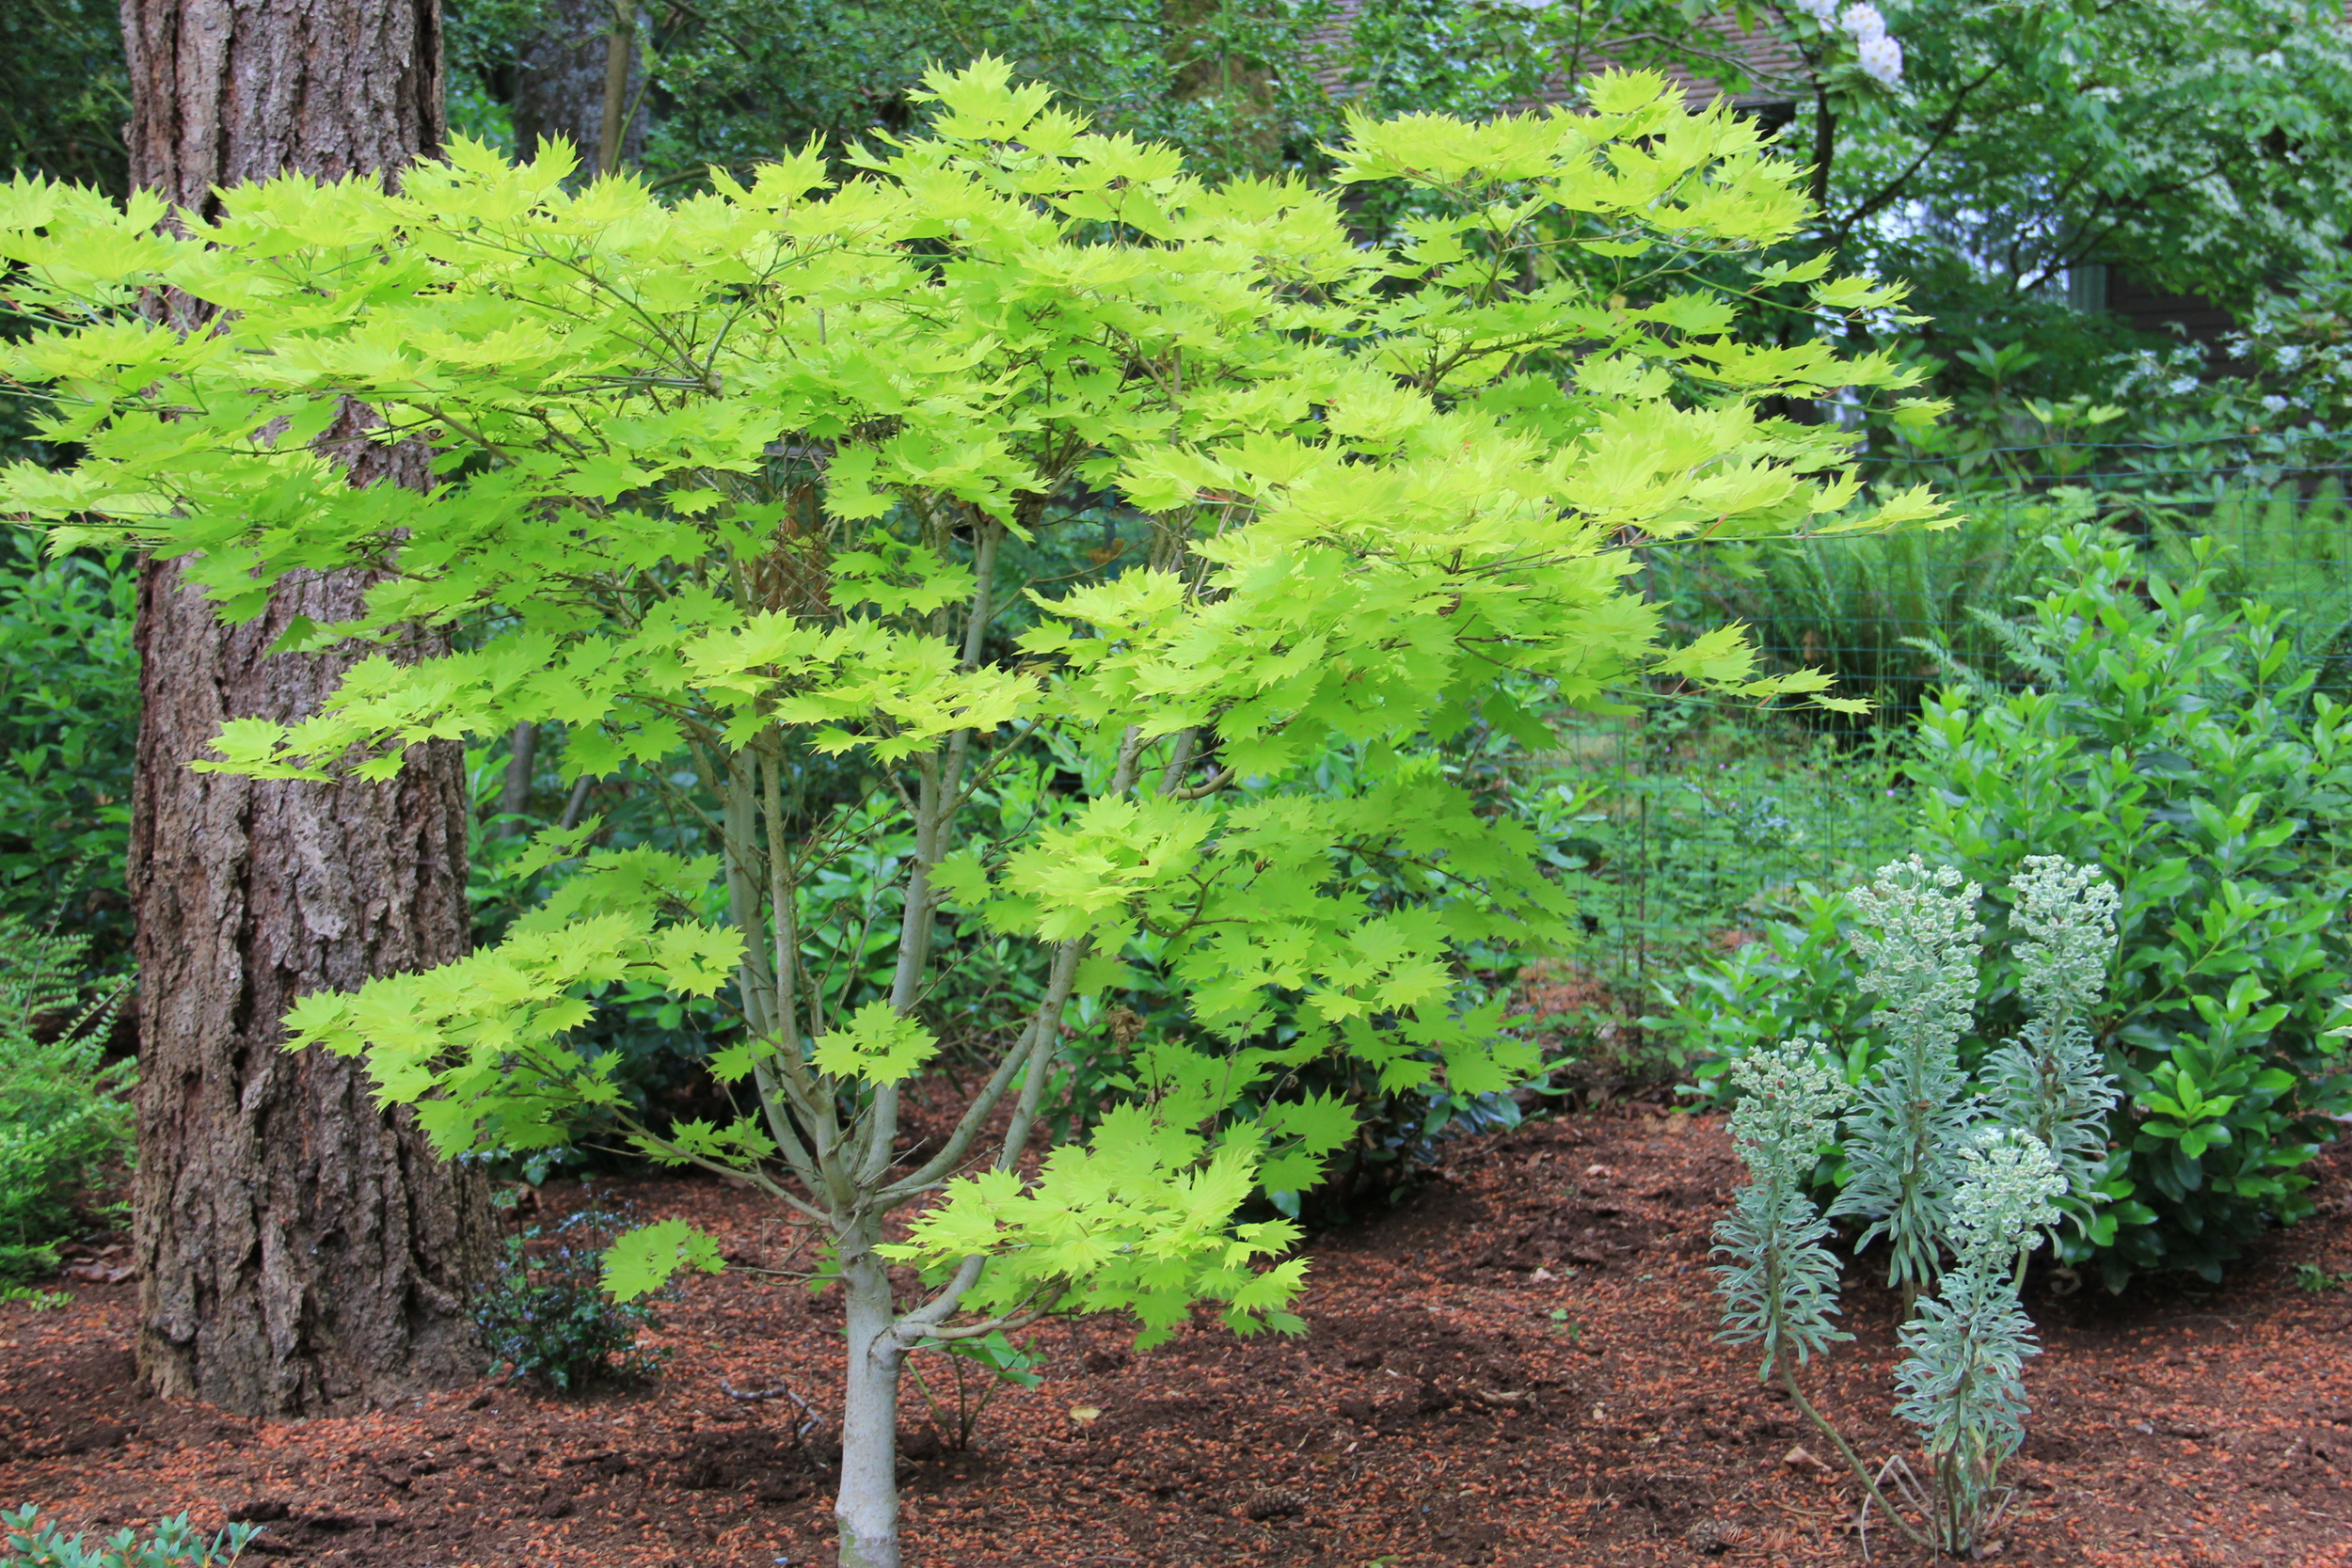 Acer shirwanasanum 'Aureum' glows in the woods